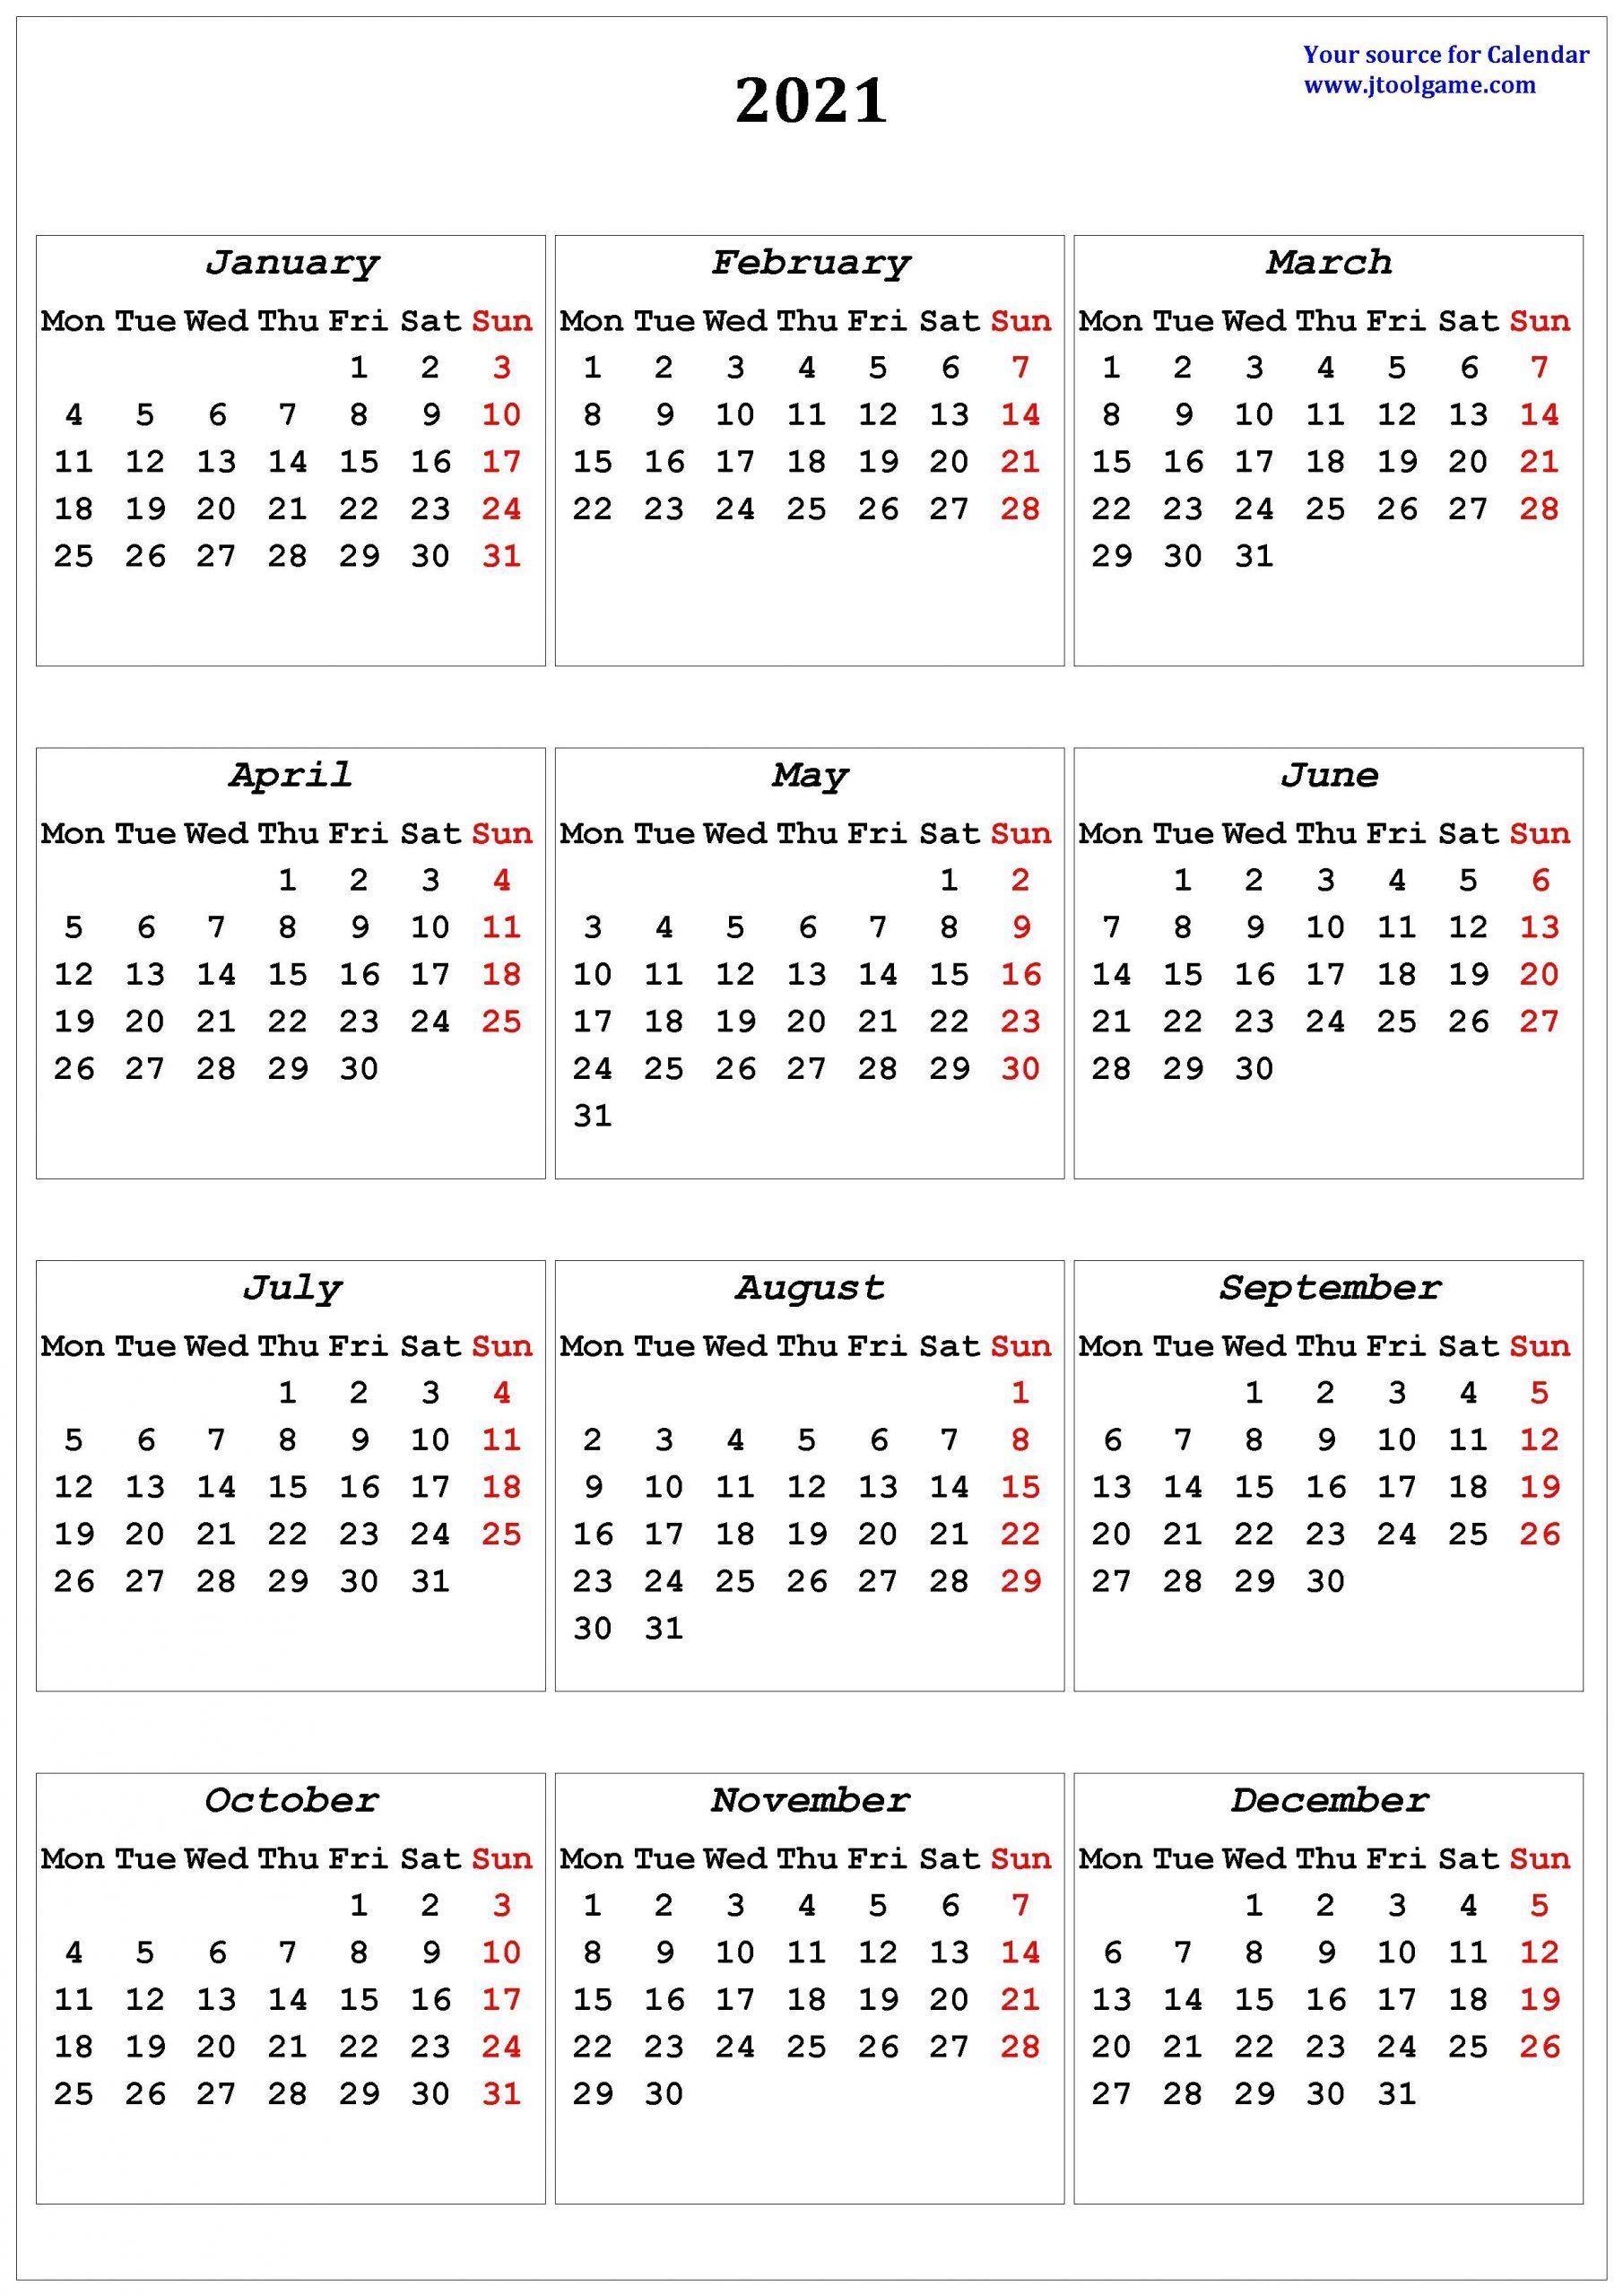 2021 Calendar - Printable Calendar With Usa Holidays with regard to 2021 Portrait Calendar Printable Graphics